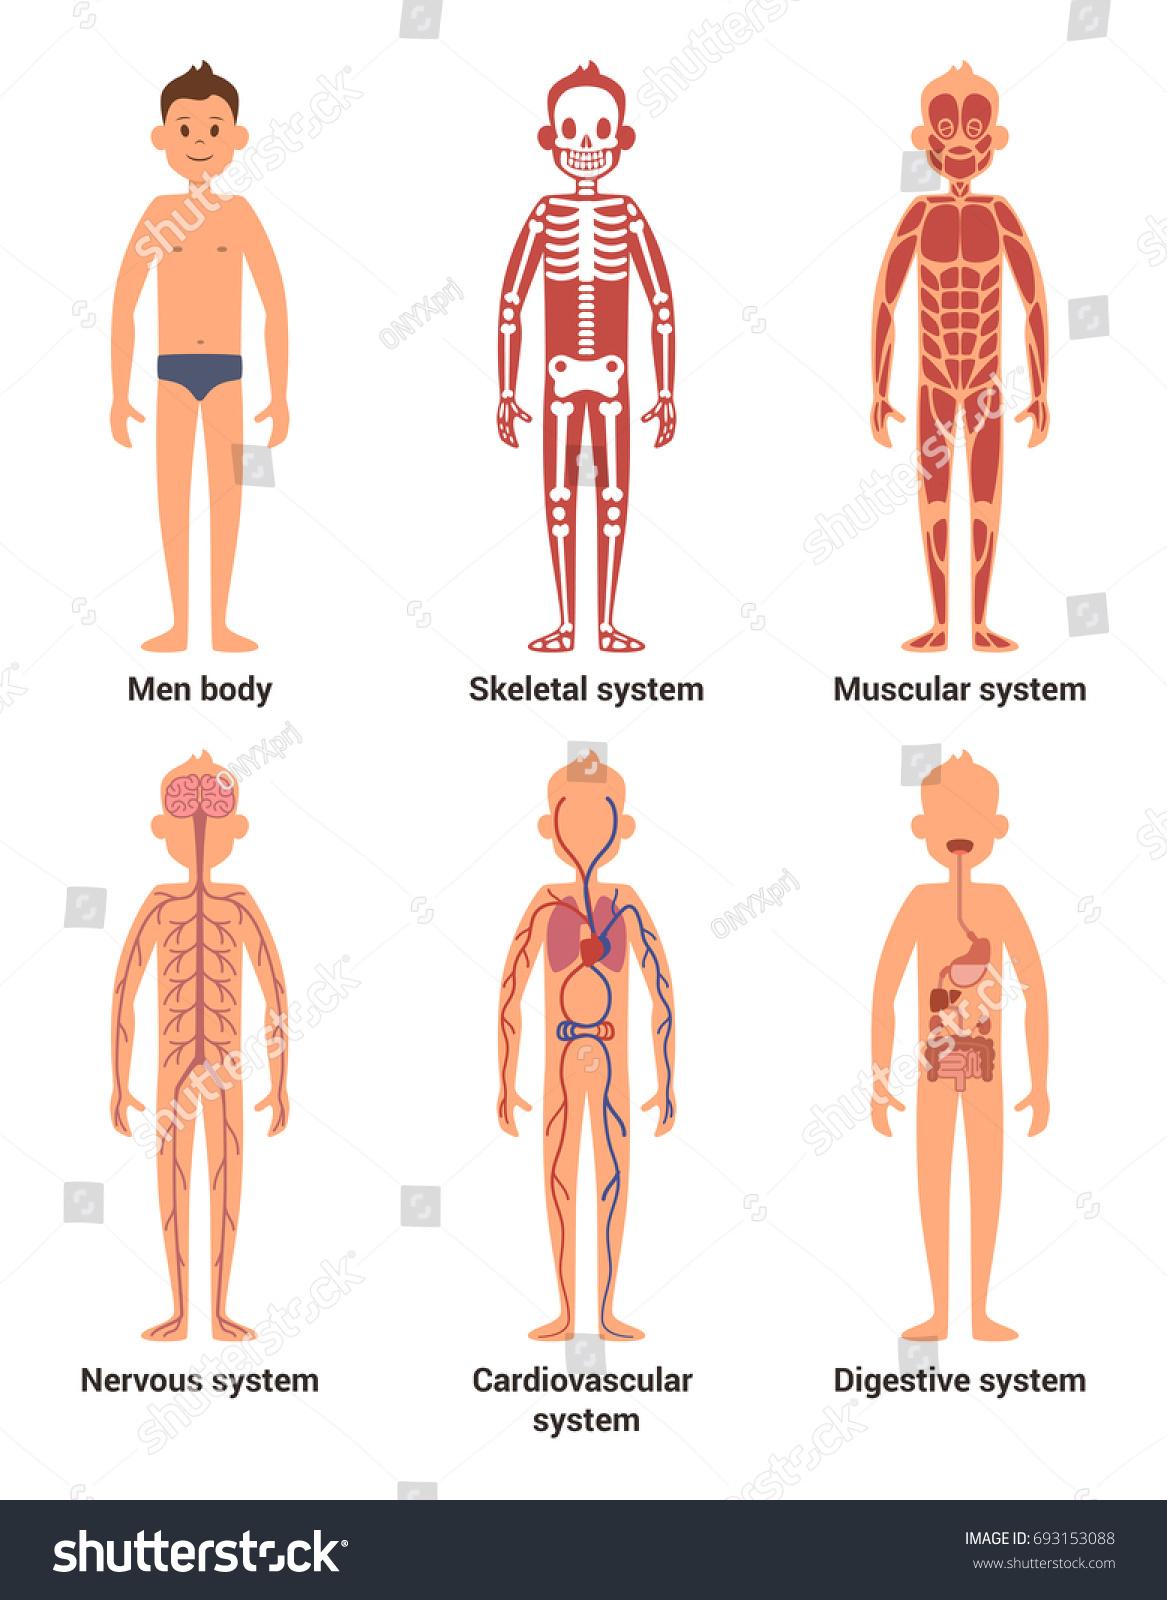 Body Anatomy Men Nerves Muscular Systems Stock Illustration